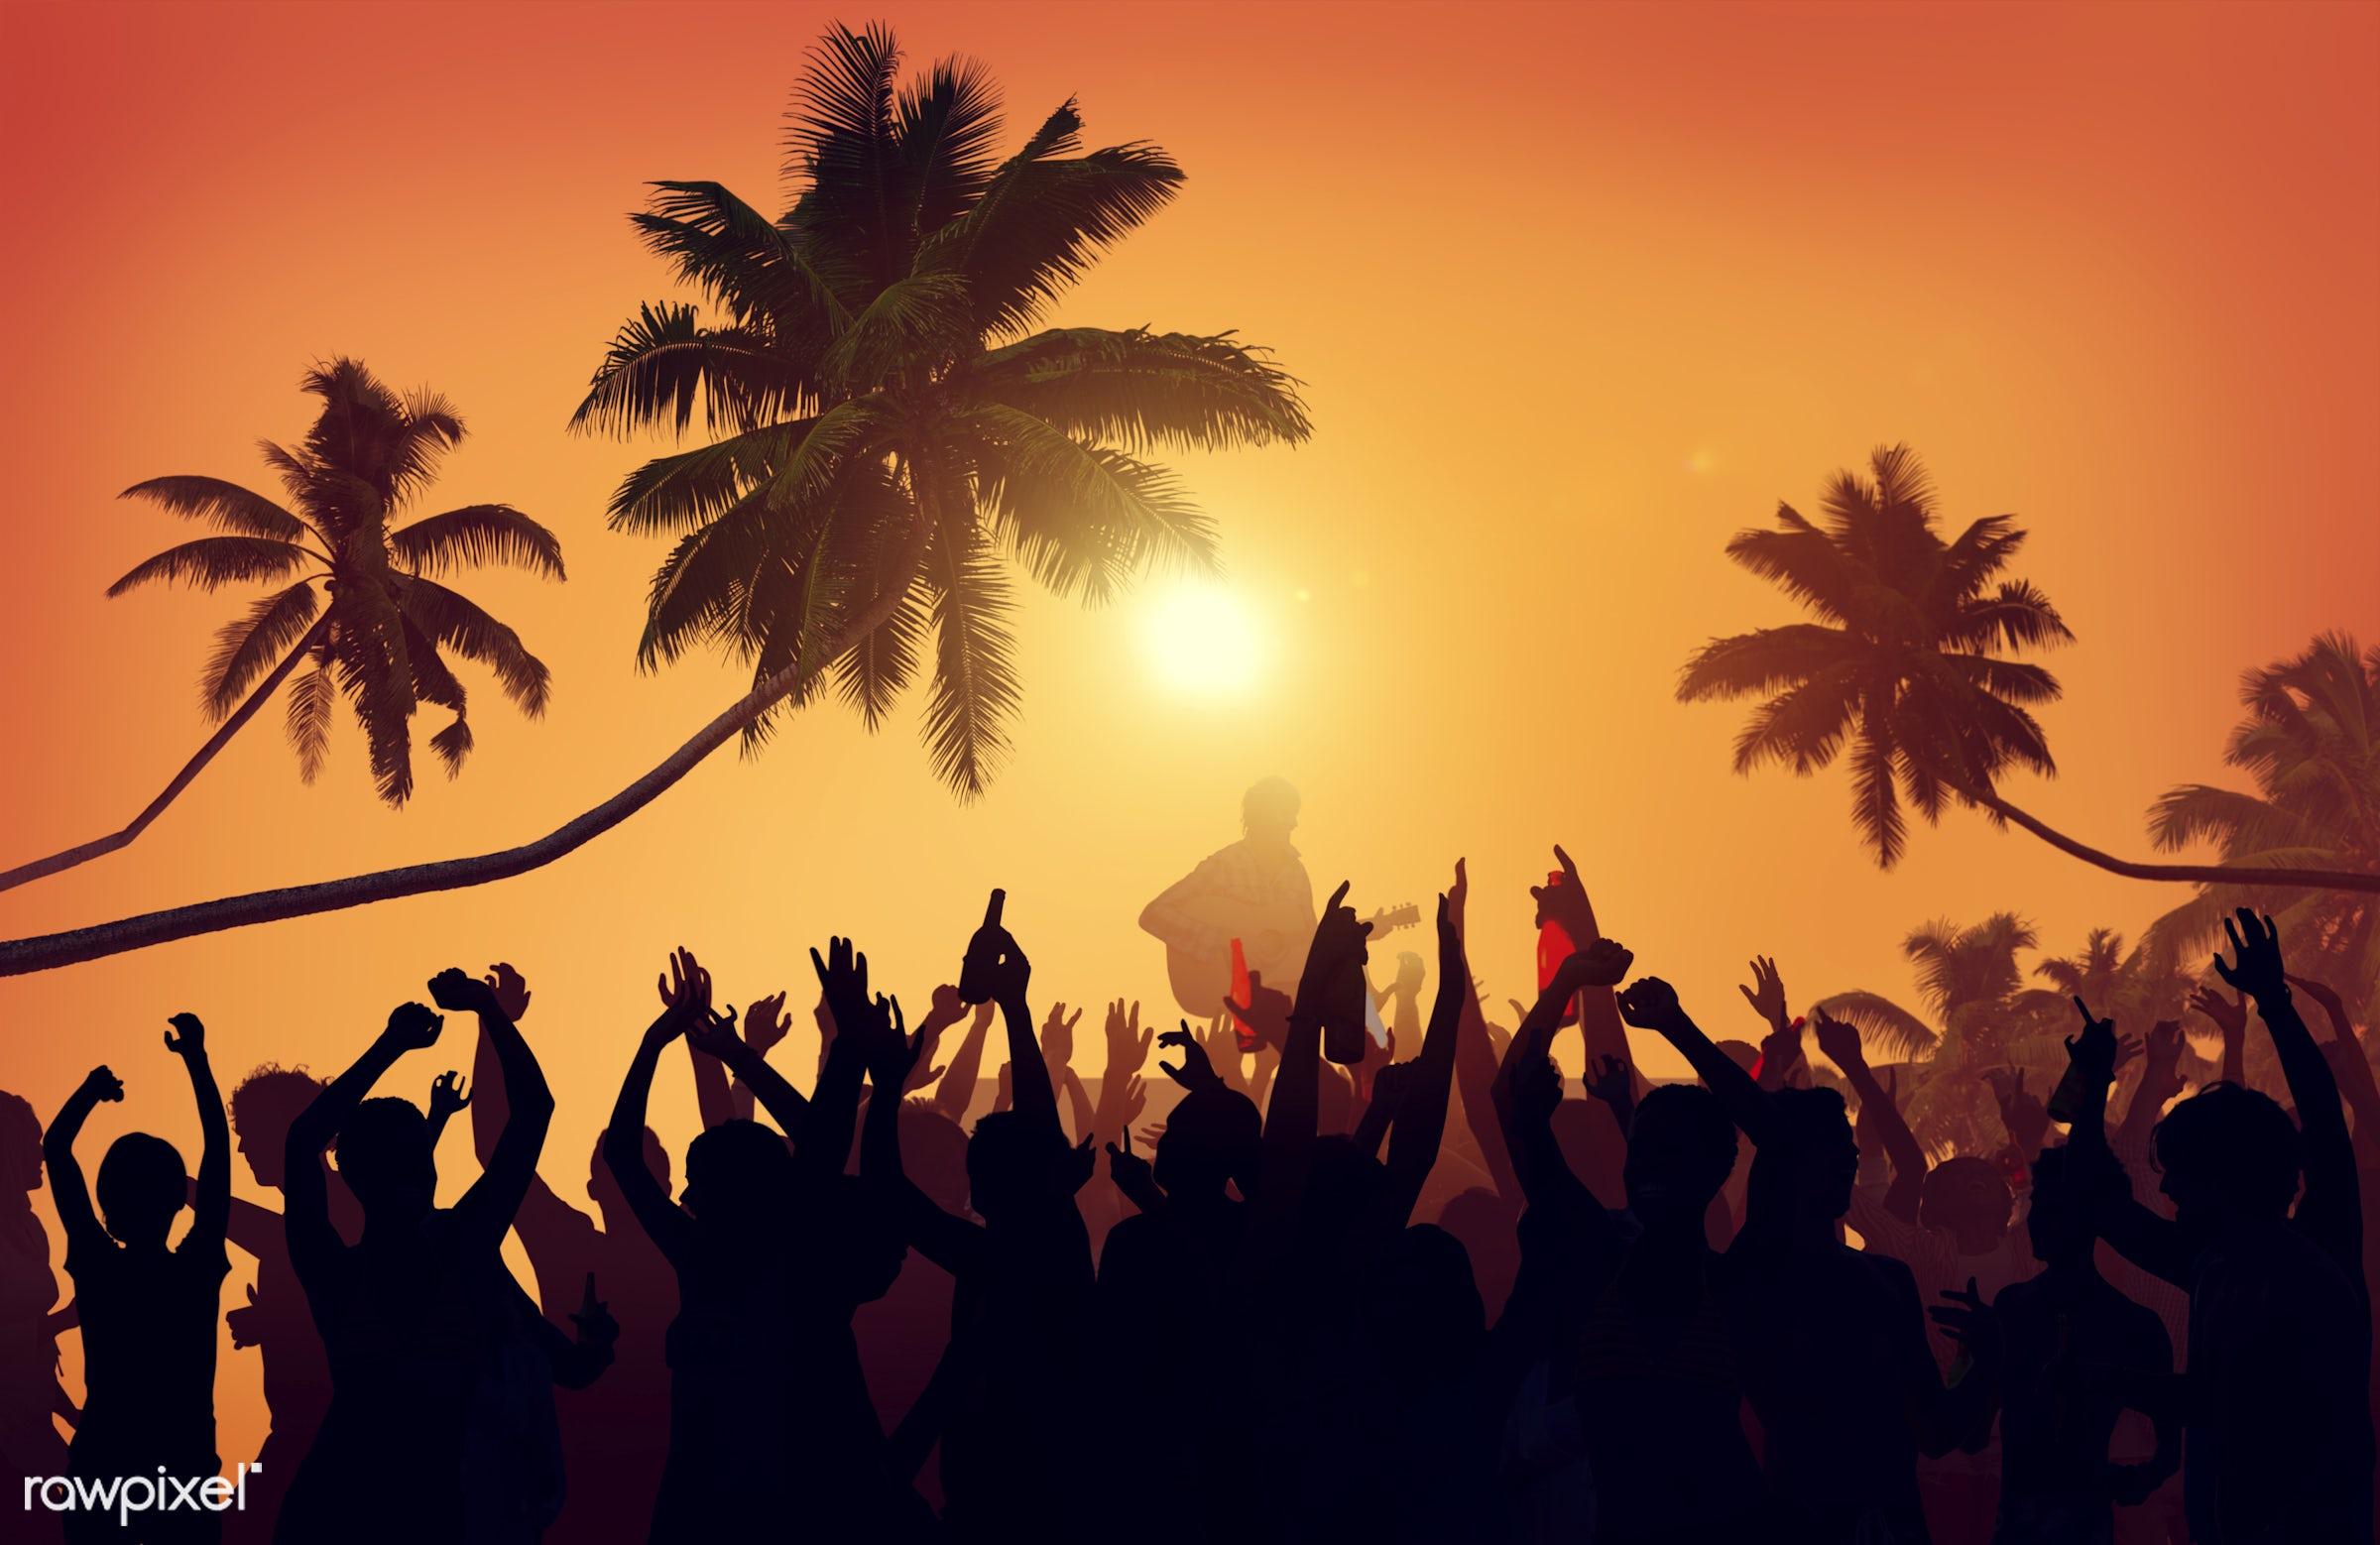 adolescence, audience, back lit, beach, carefree, celebration, cheerful, coconut palm tree, communication, community,...